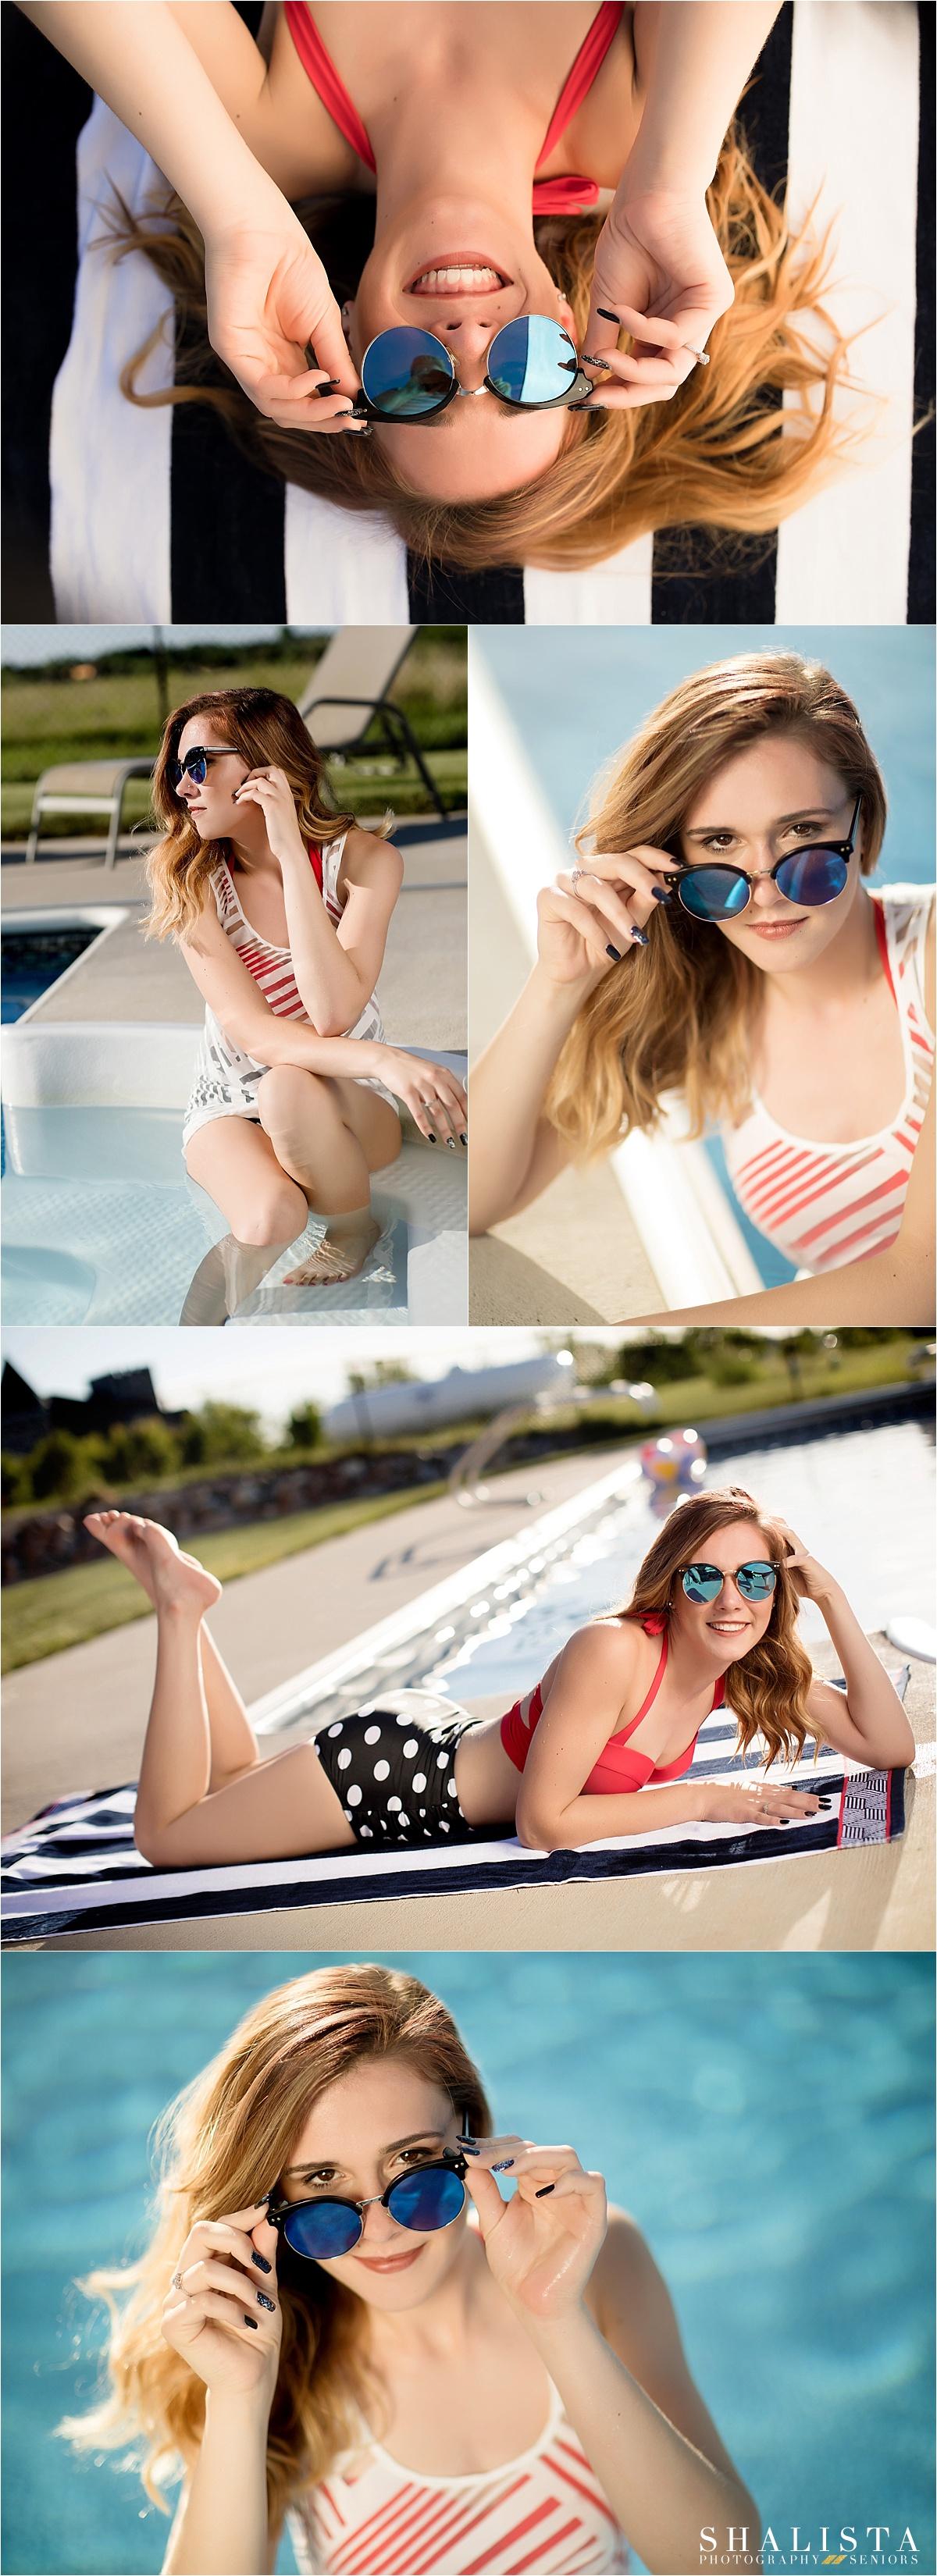 Summer Pool Senior Girl Photos